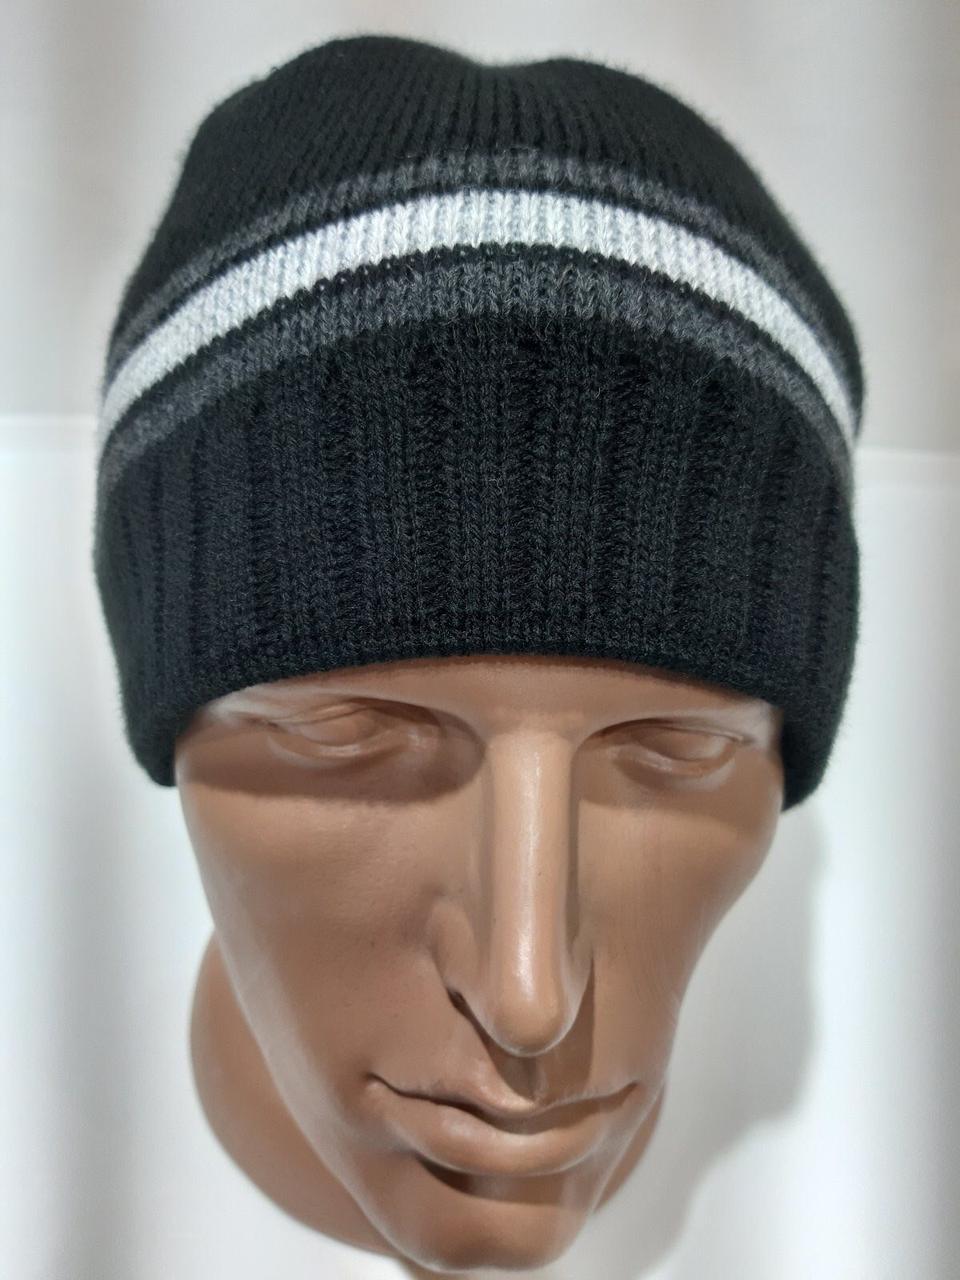 Мужская шерстяная шапка на флисе зимняя черная